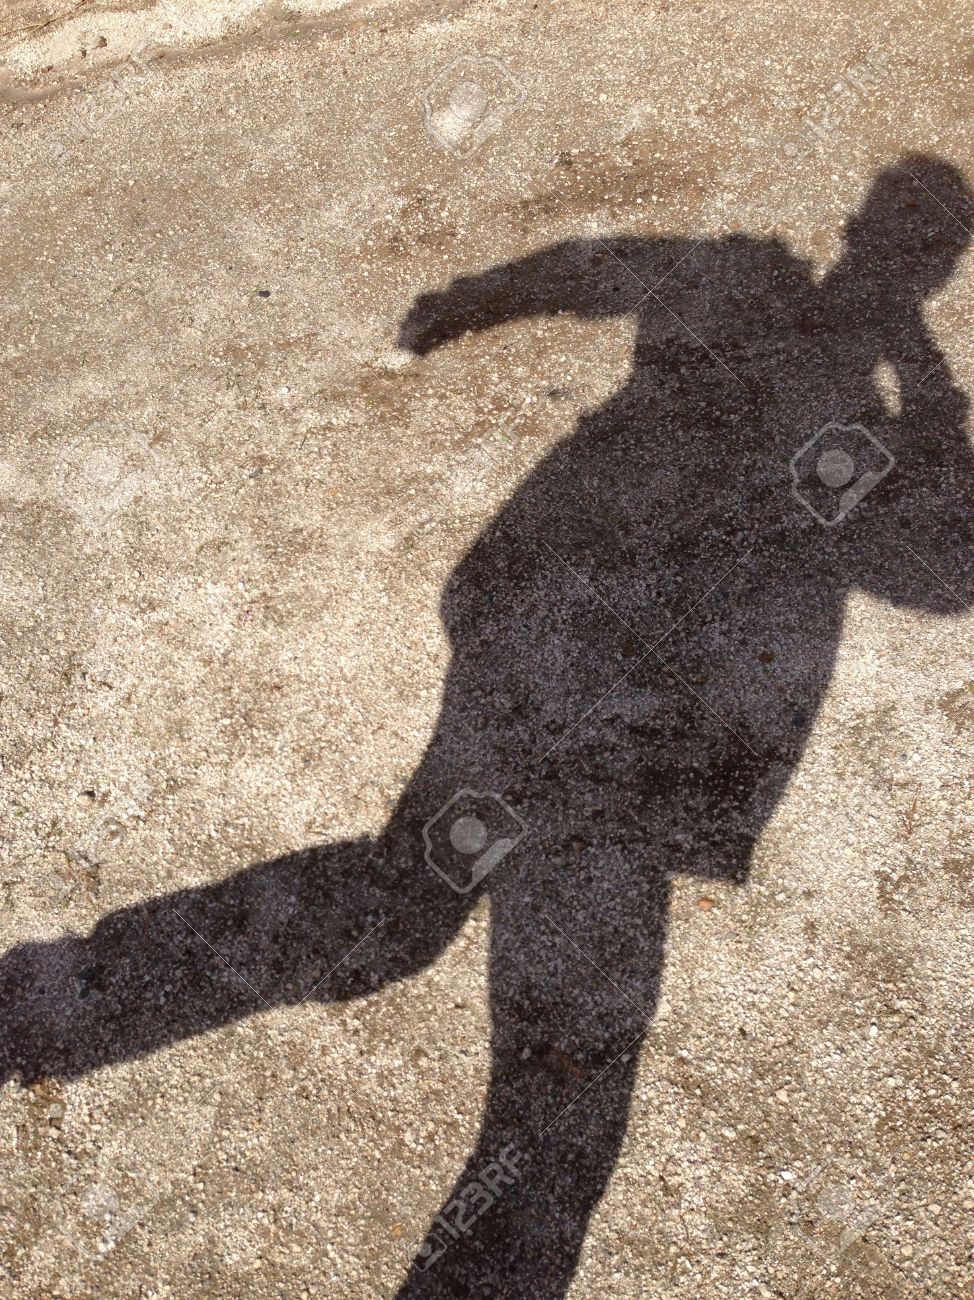 La Sombra De Una Persona Presentacion